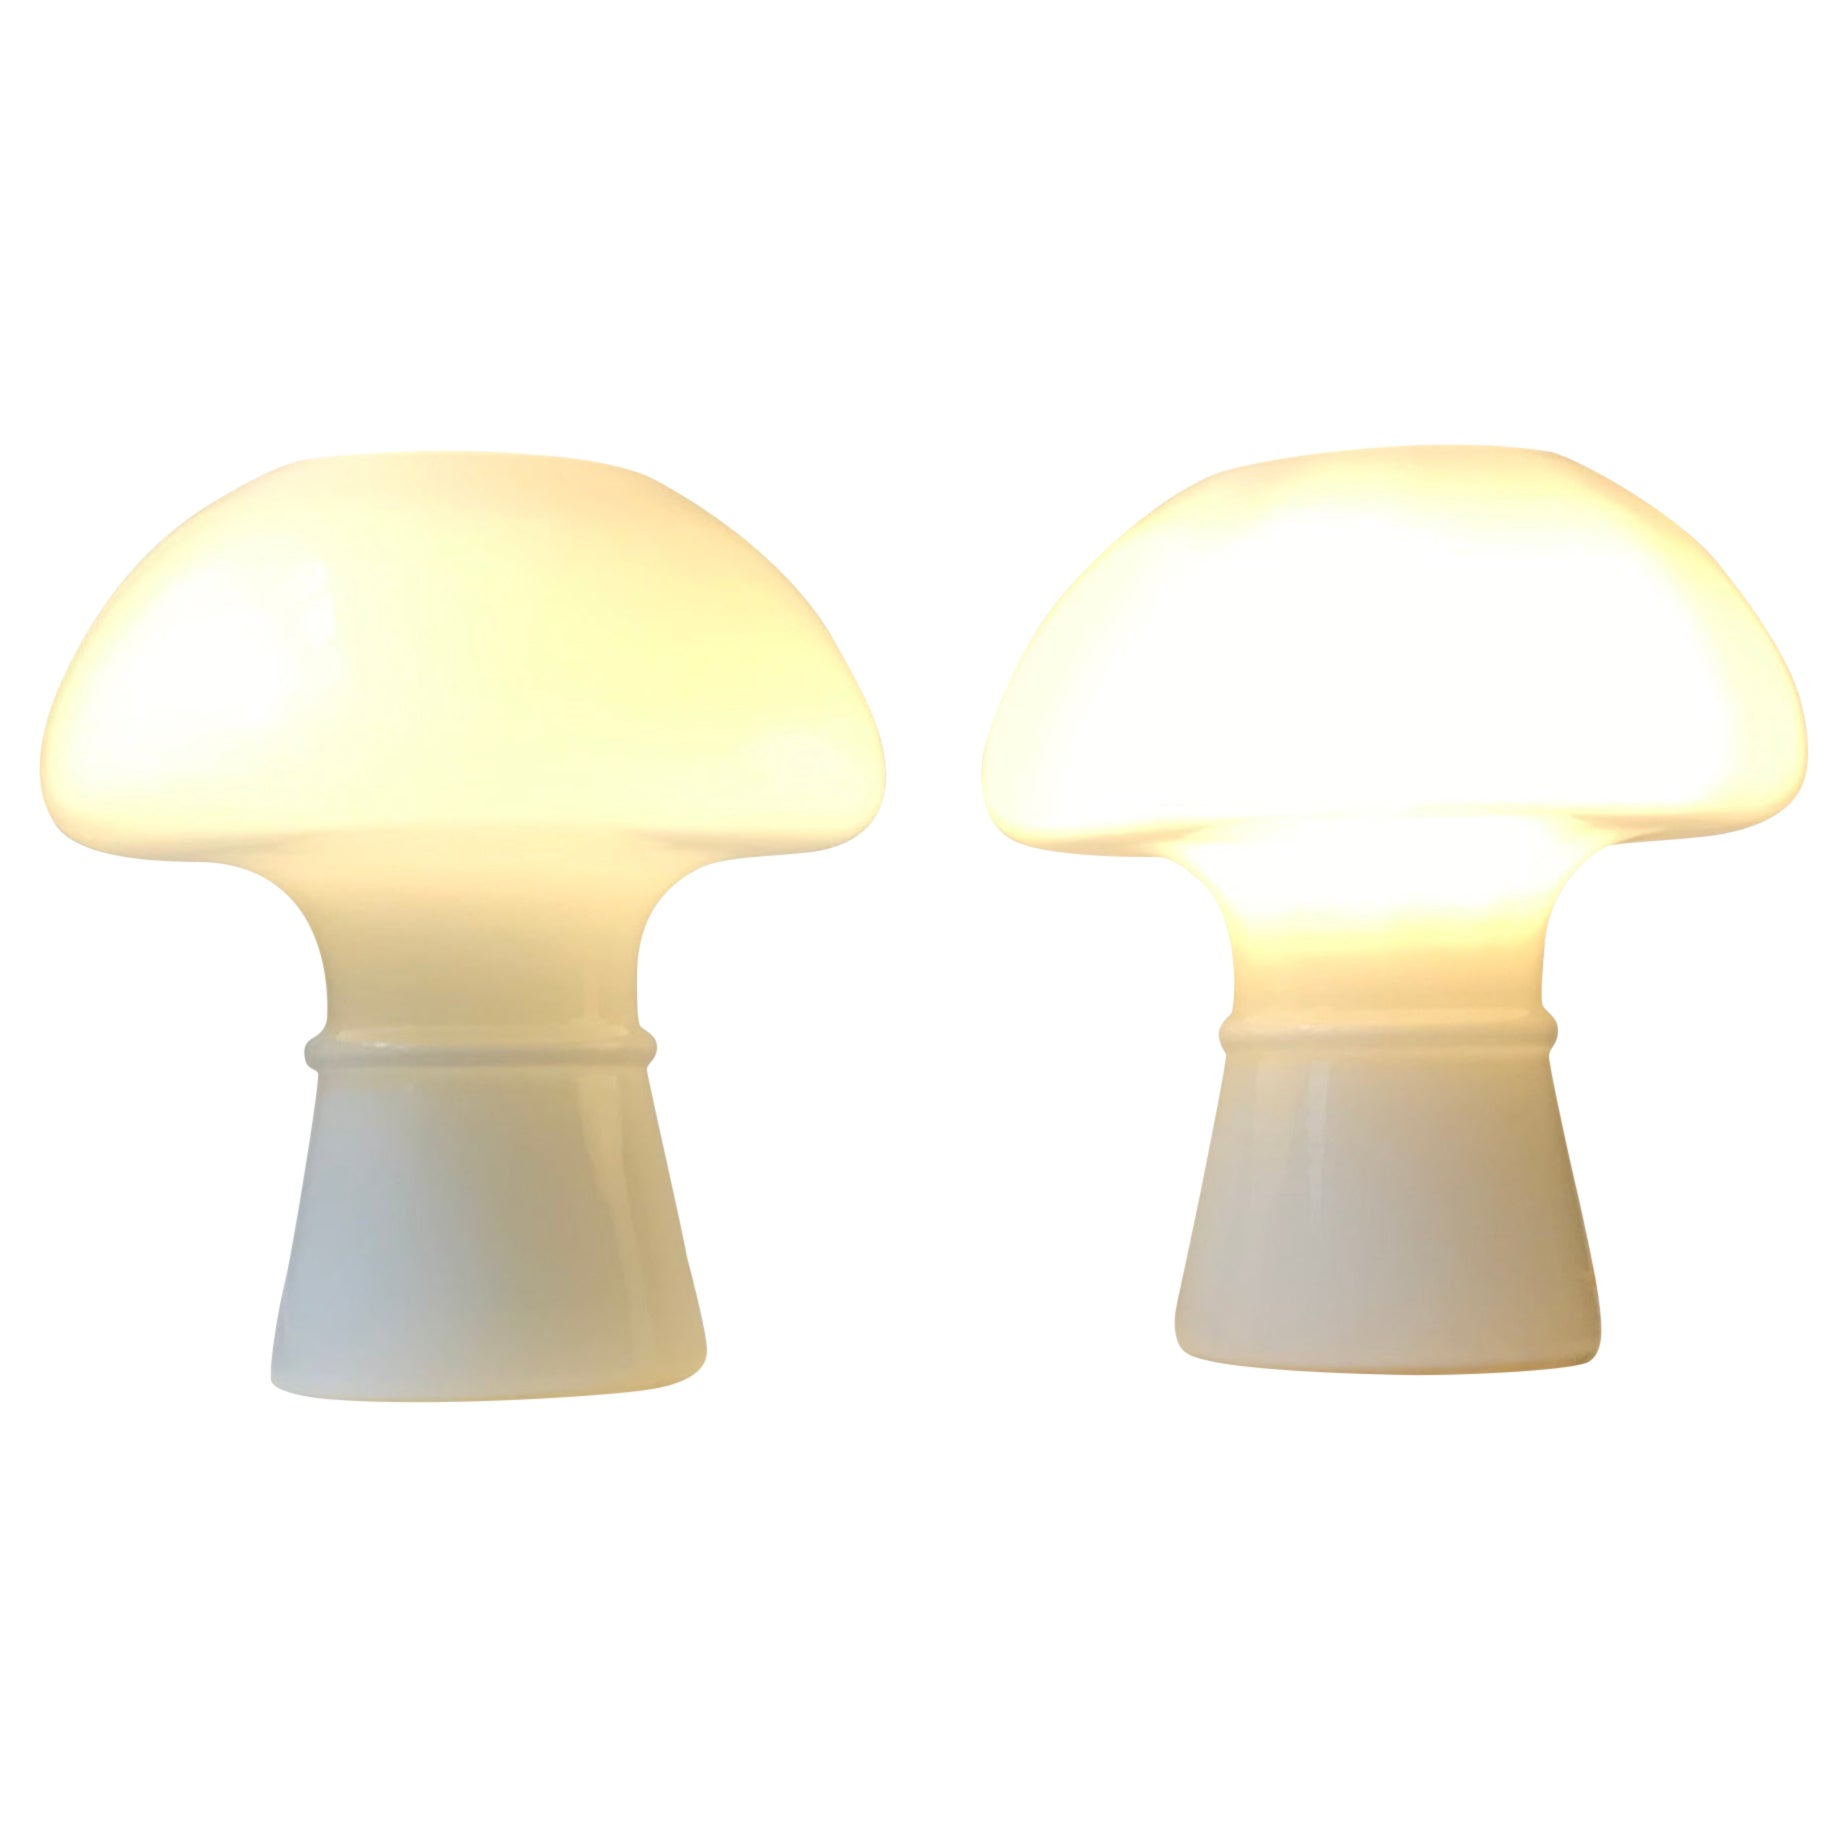 White Minimalist Murano Glass Mushroom Table Lamps, Italy 1970s